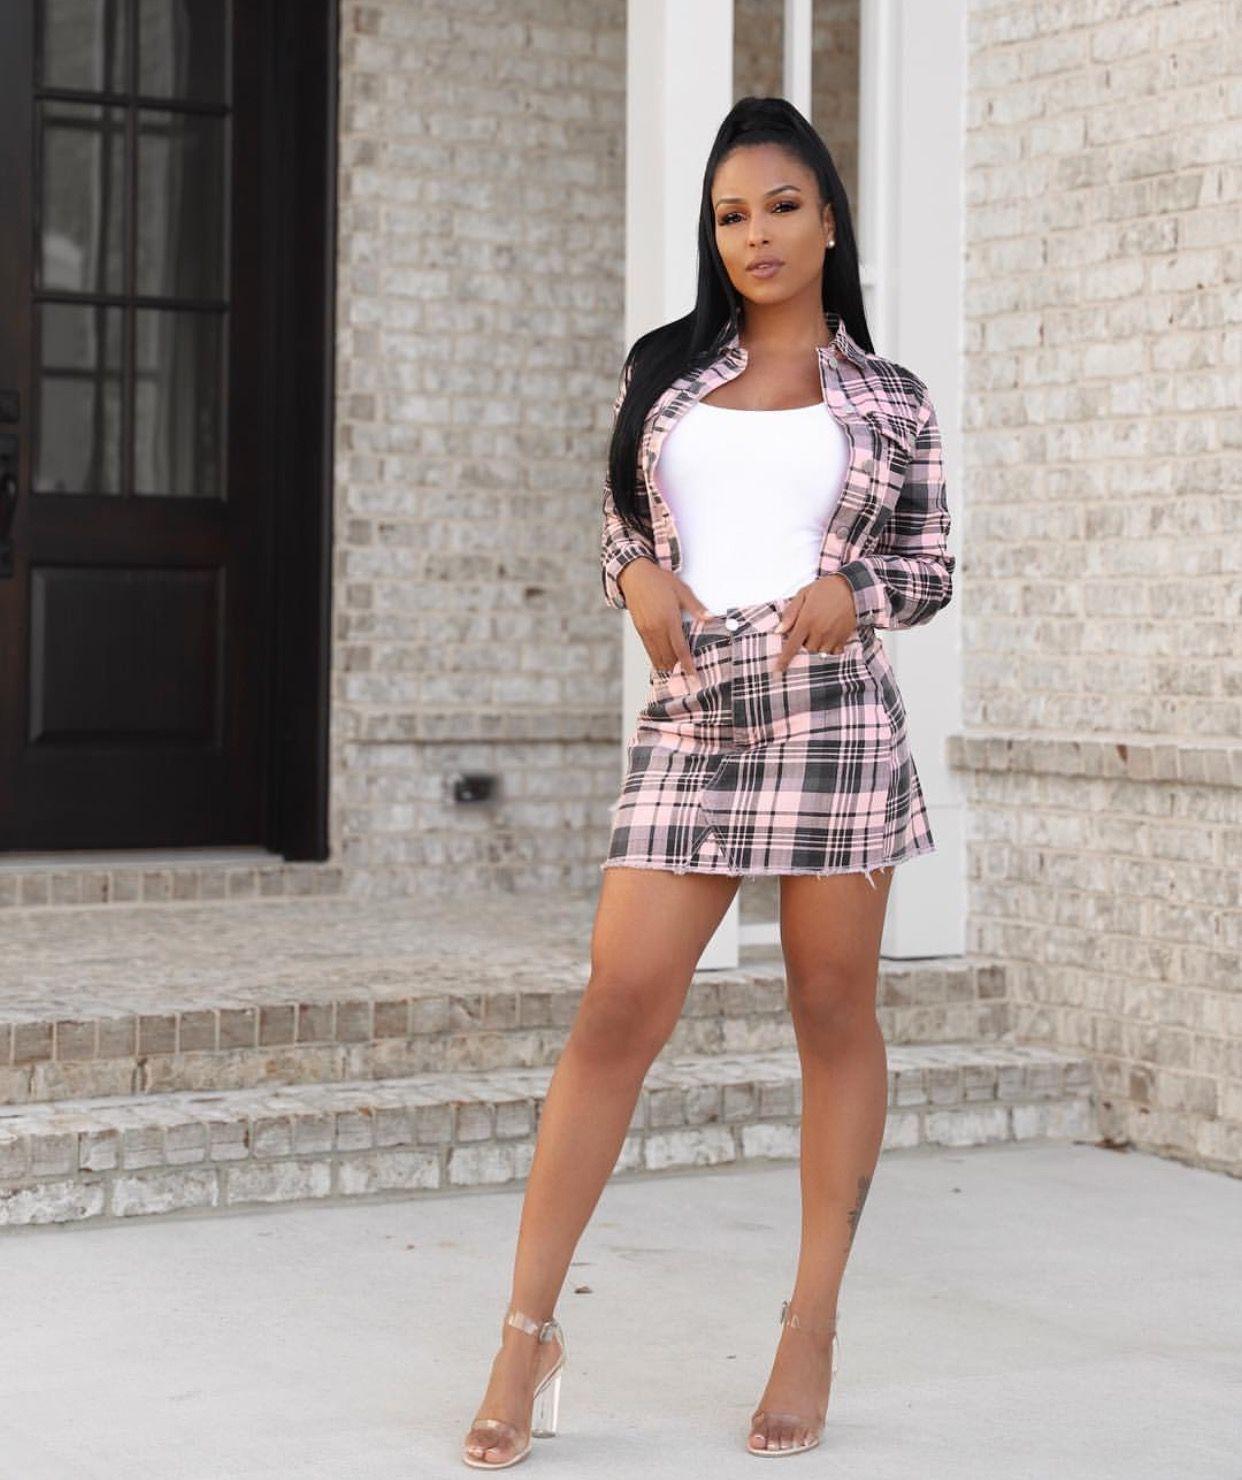 Latoyaforever Outfit Fashionnova ғdshiwp Bdbss ۺ Pinterest